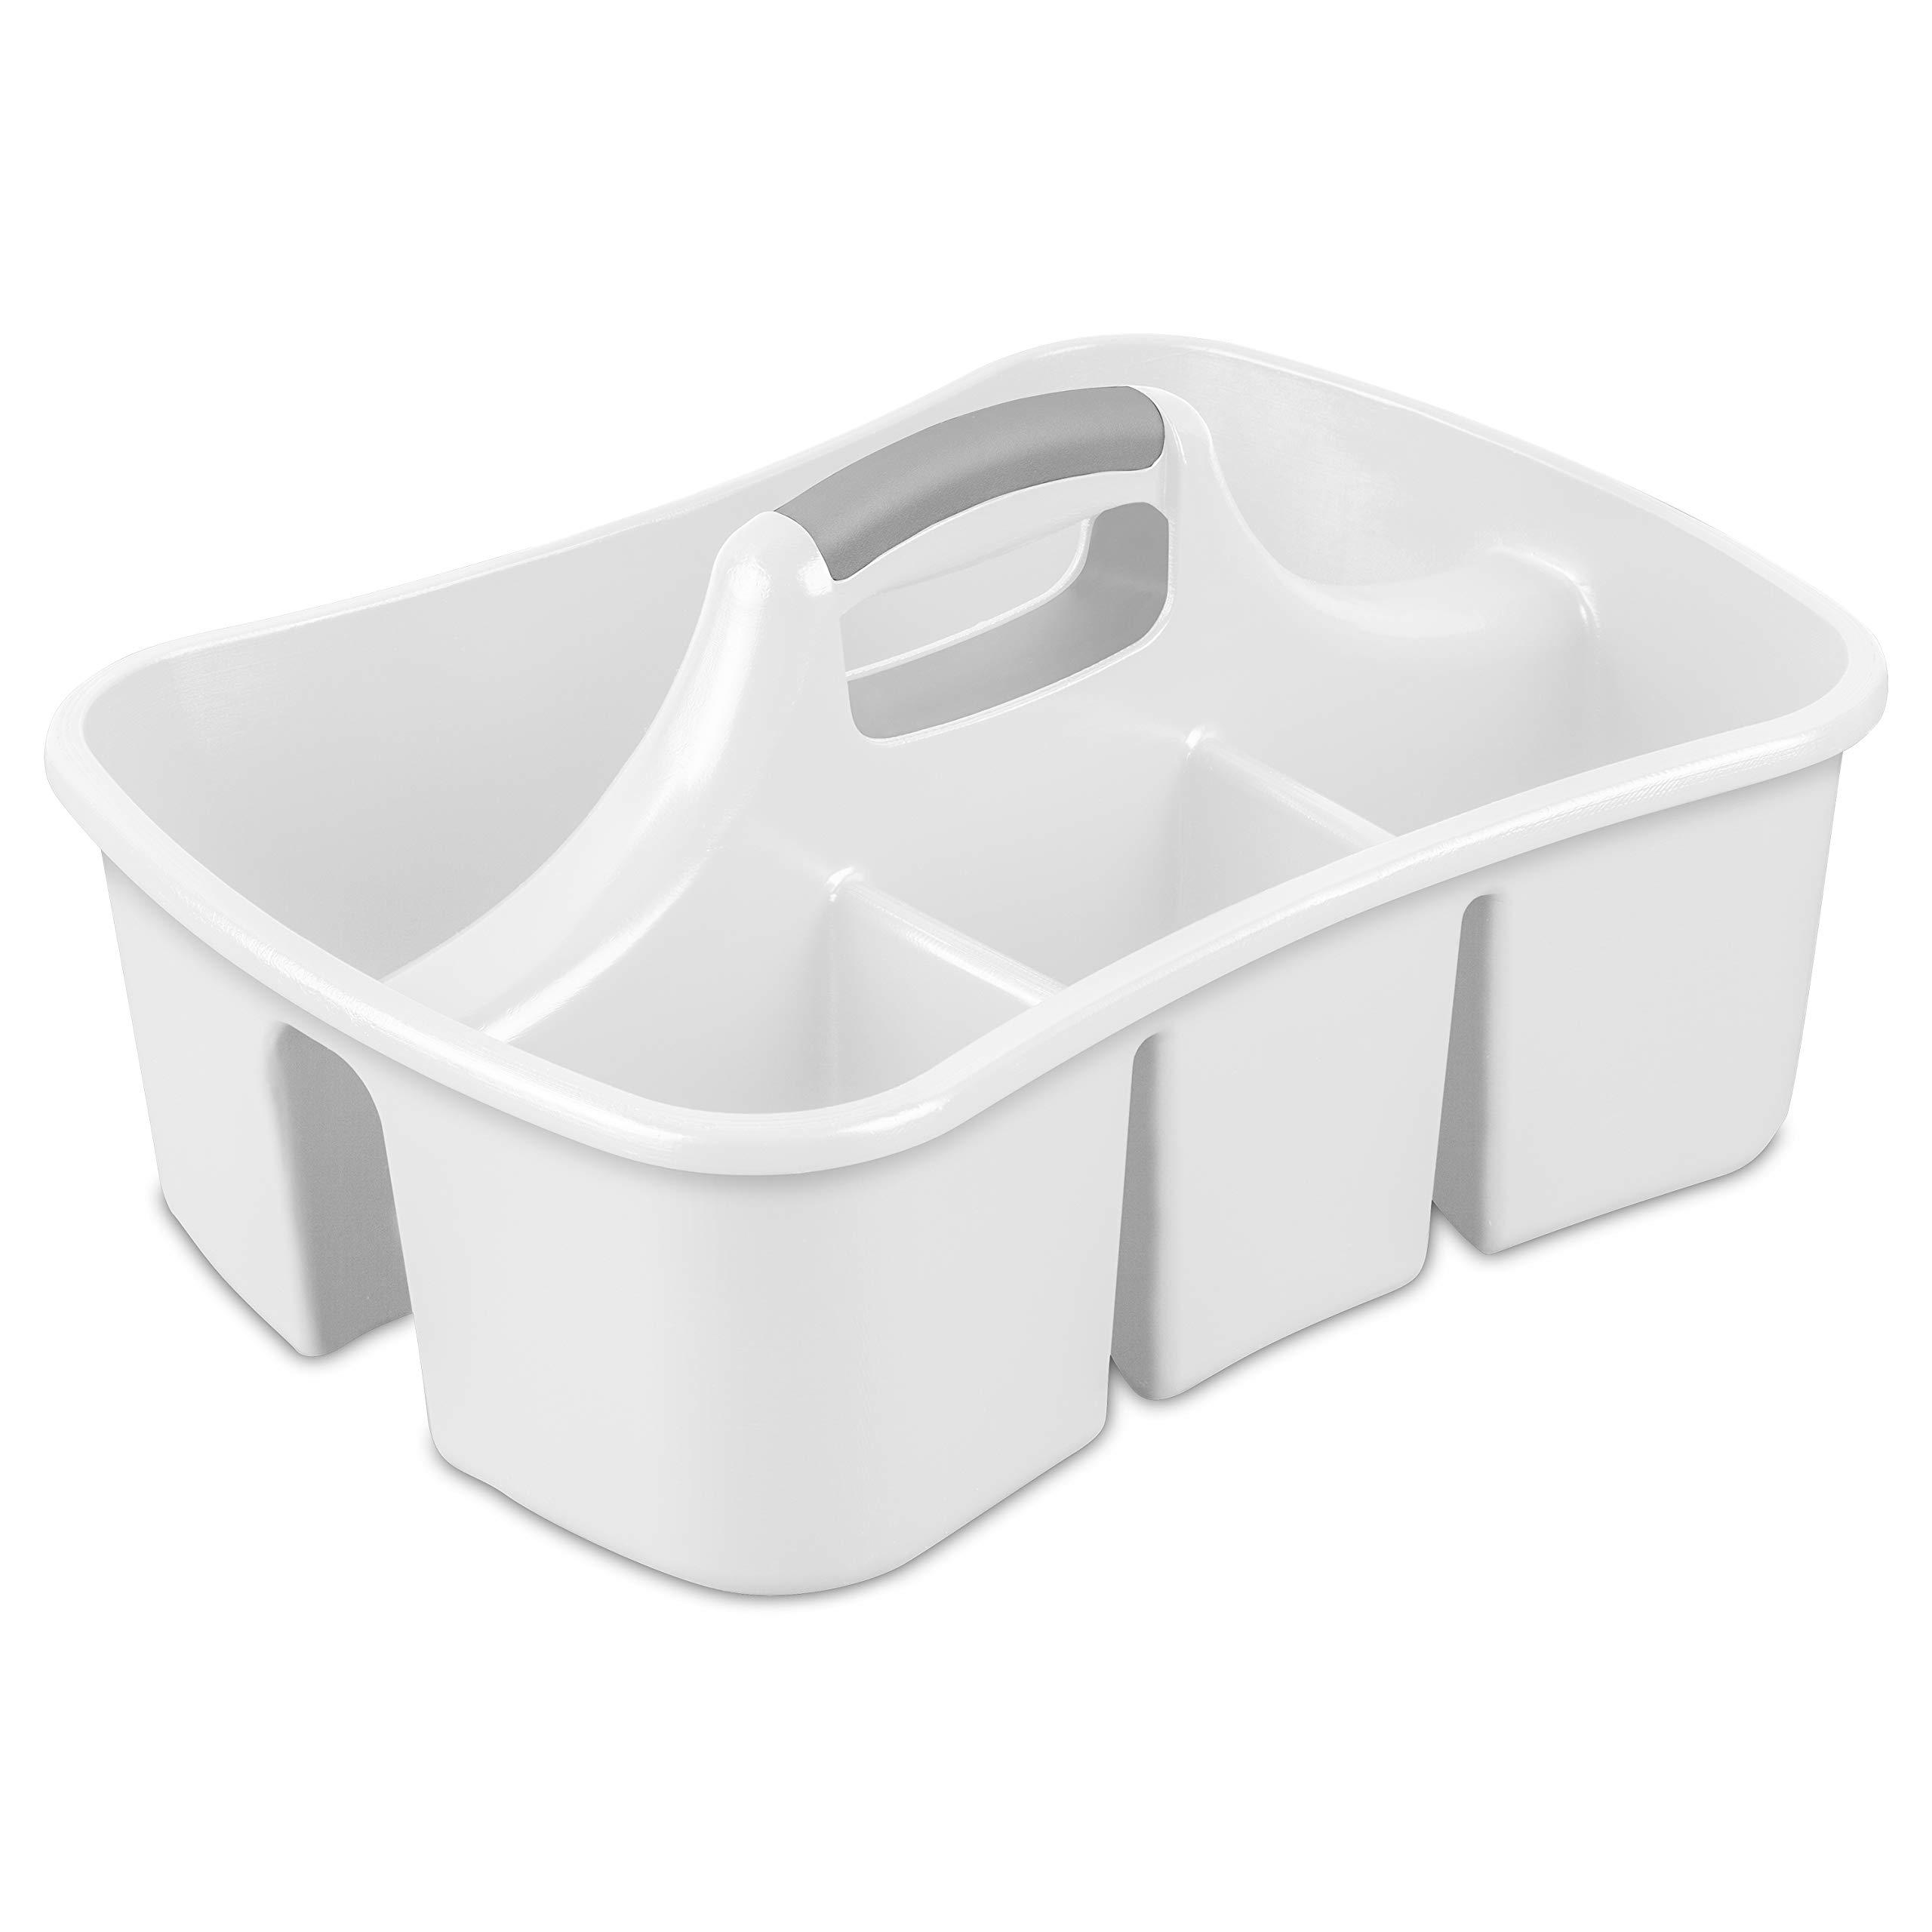 Sterilite 15888006 Divided Ultra Caddy, White Caddy w/ Titanium Insert, 6-Pack by STERILITE (Image #2)